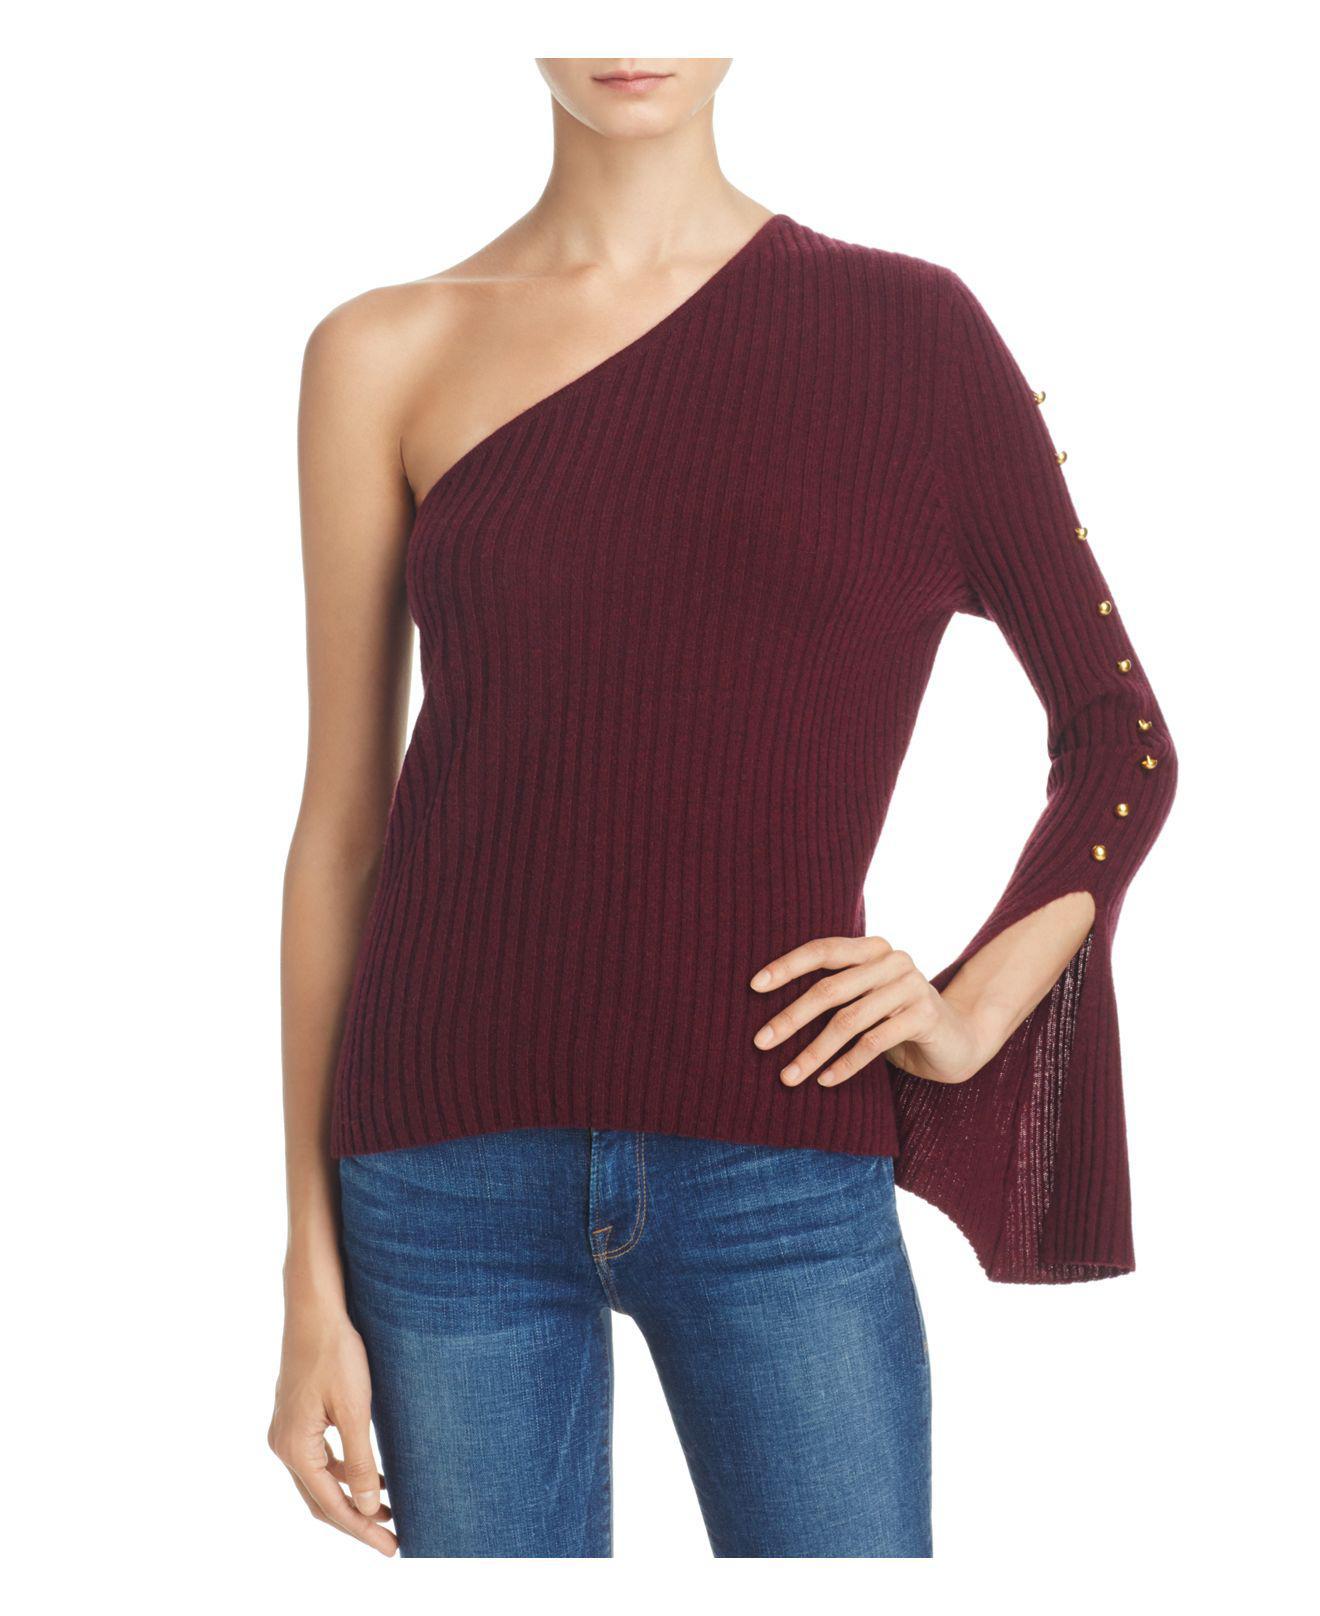 lyst aqua cashmere ribbed one shoulder sweater in purple. Black Bedroom Furniture Sets. Home Design Ideas